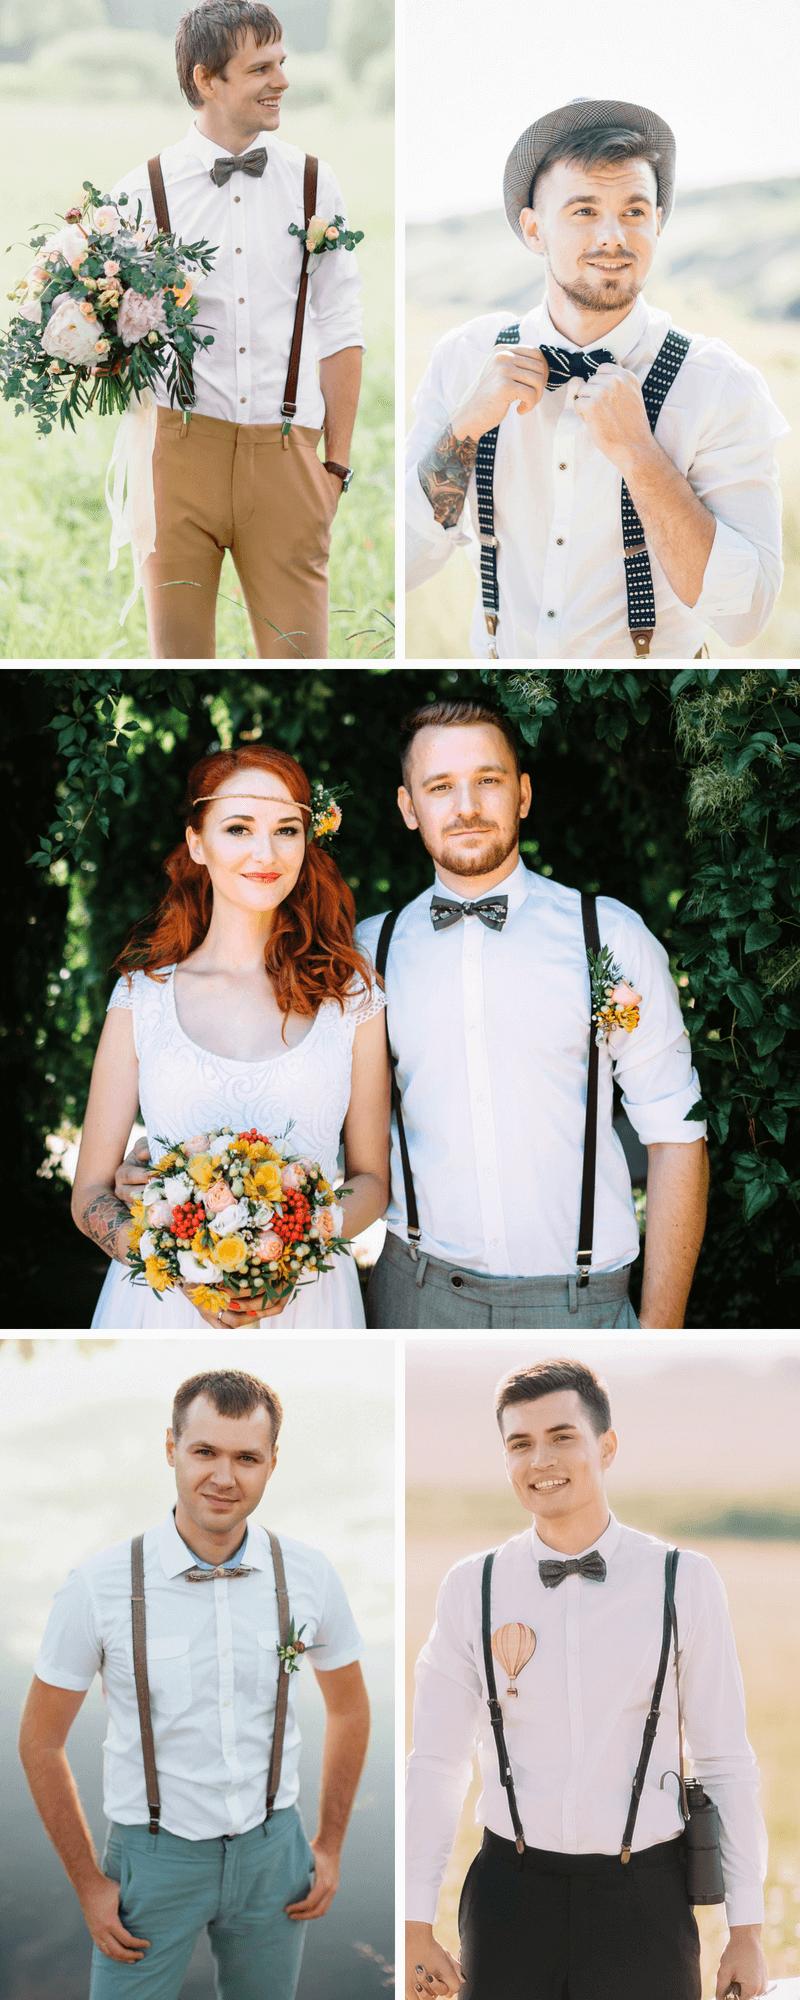 Elegant Bräutigam Vintage Reference Of Bräutigam Outfit, Hochzeitsanzug, Hochzeit Anzug Ideen, Bräutigam